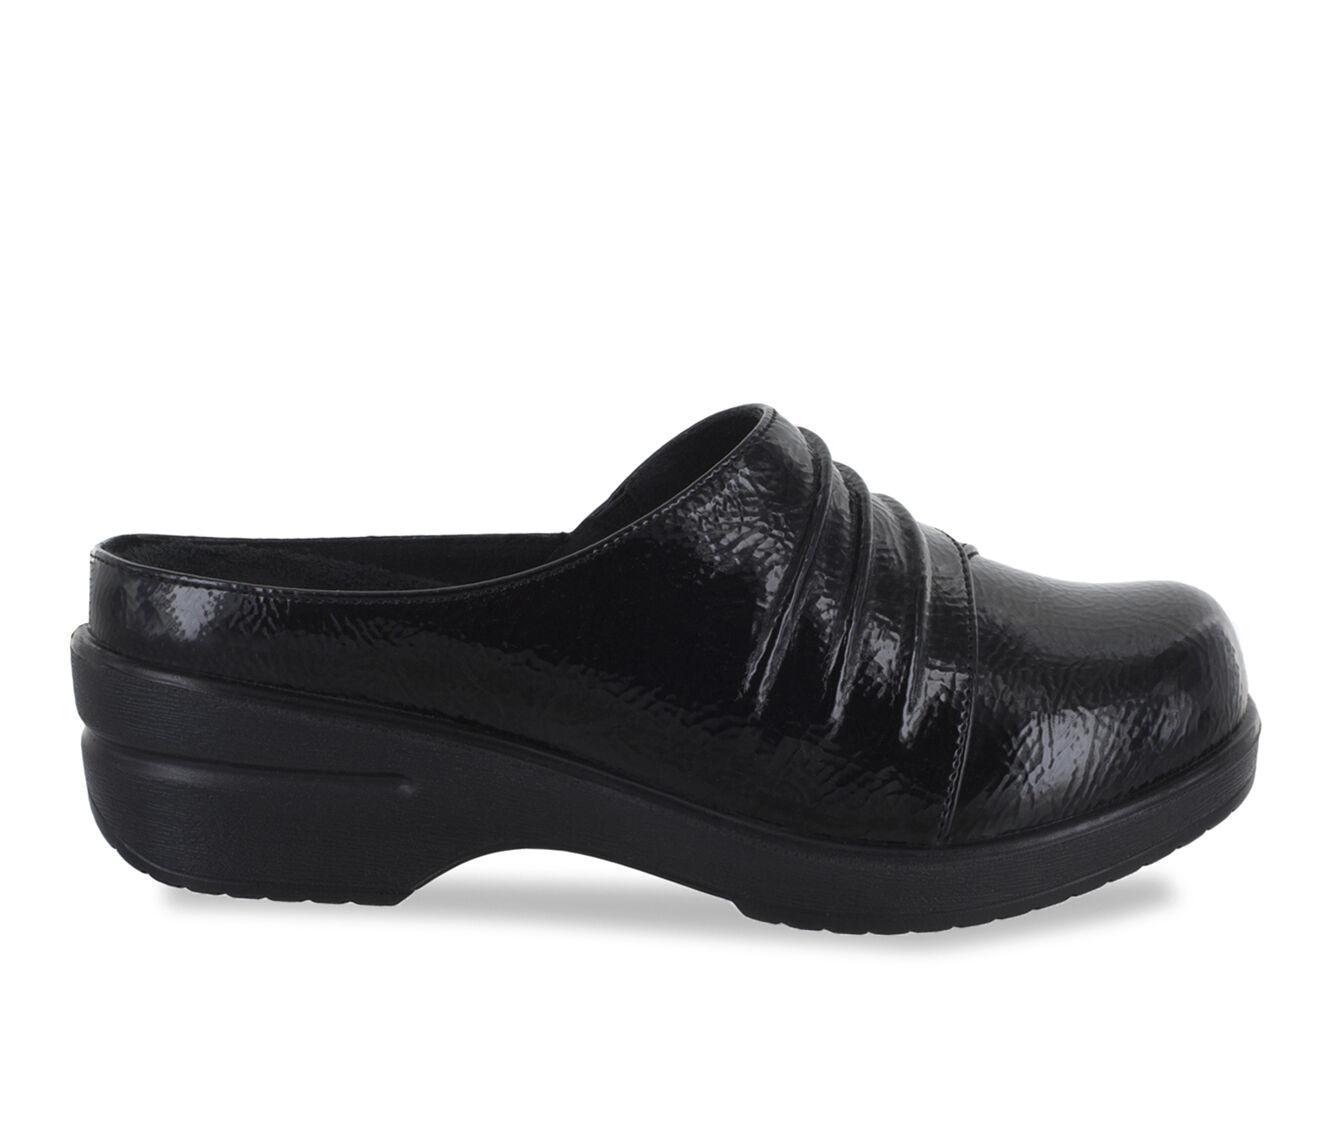 Women's Easy Street Oren Shoes Black Patent